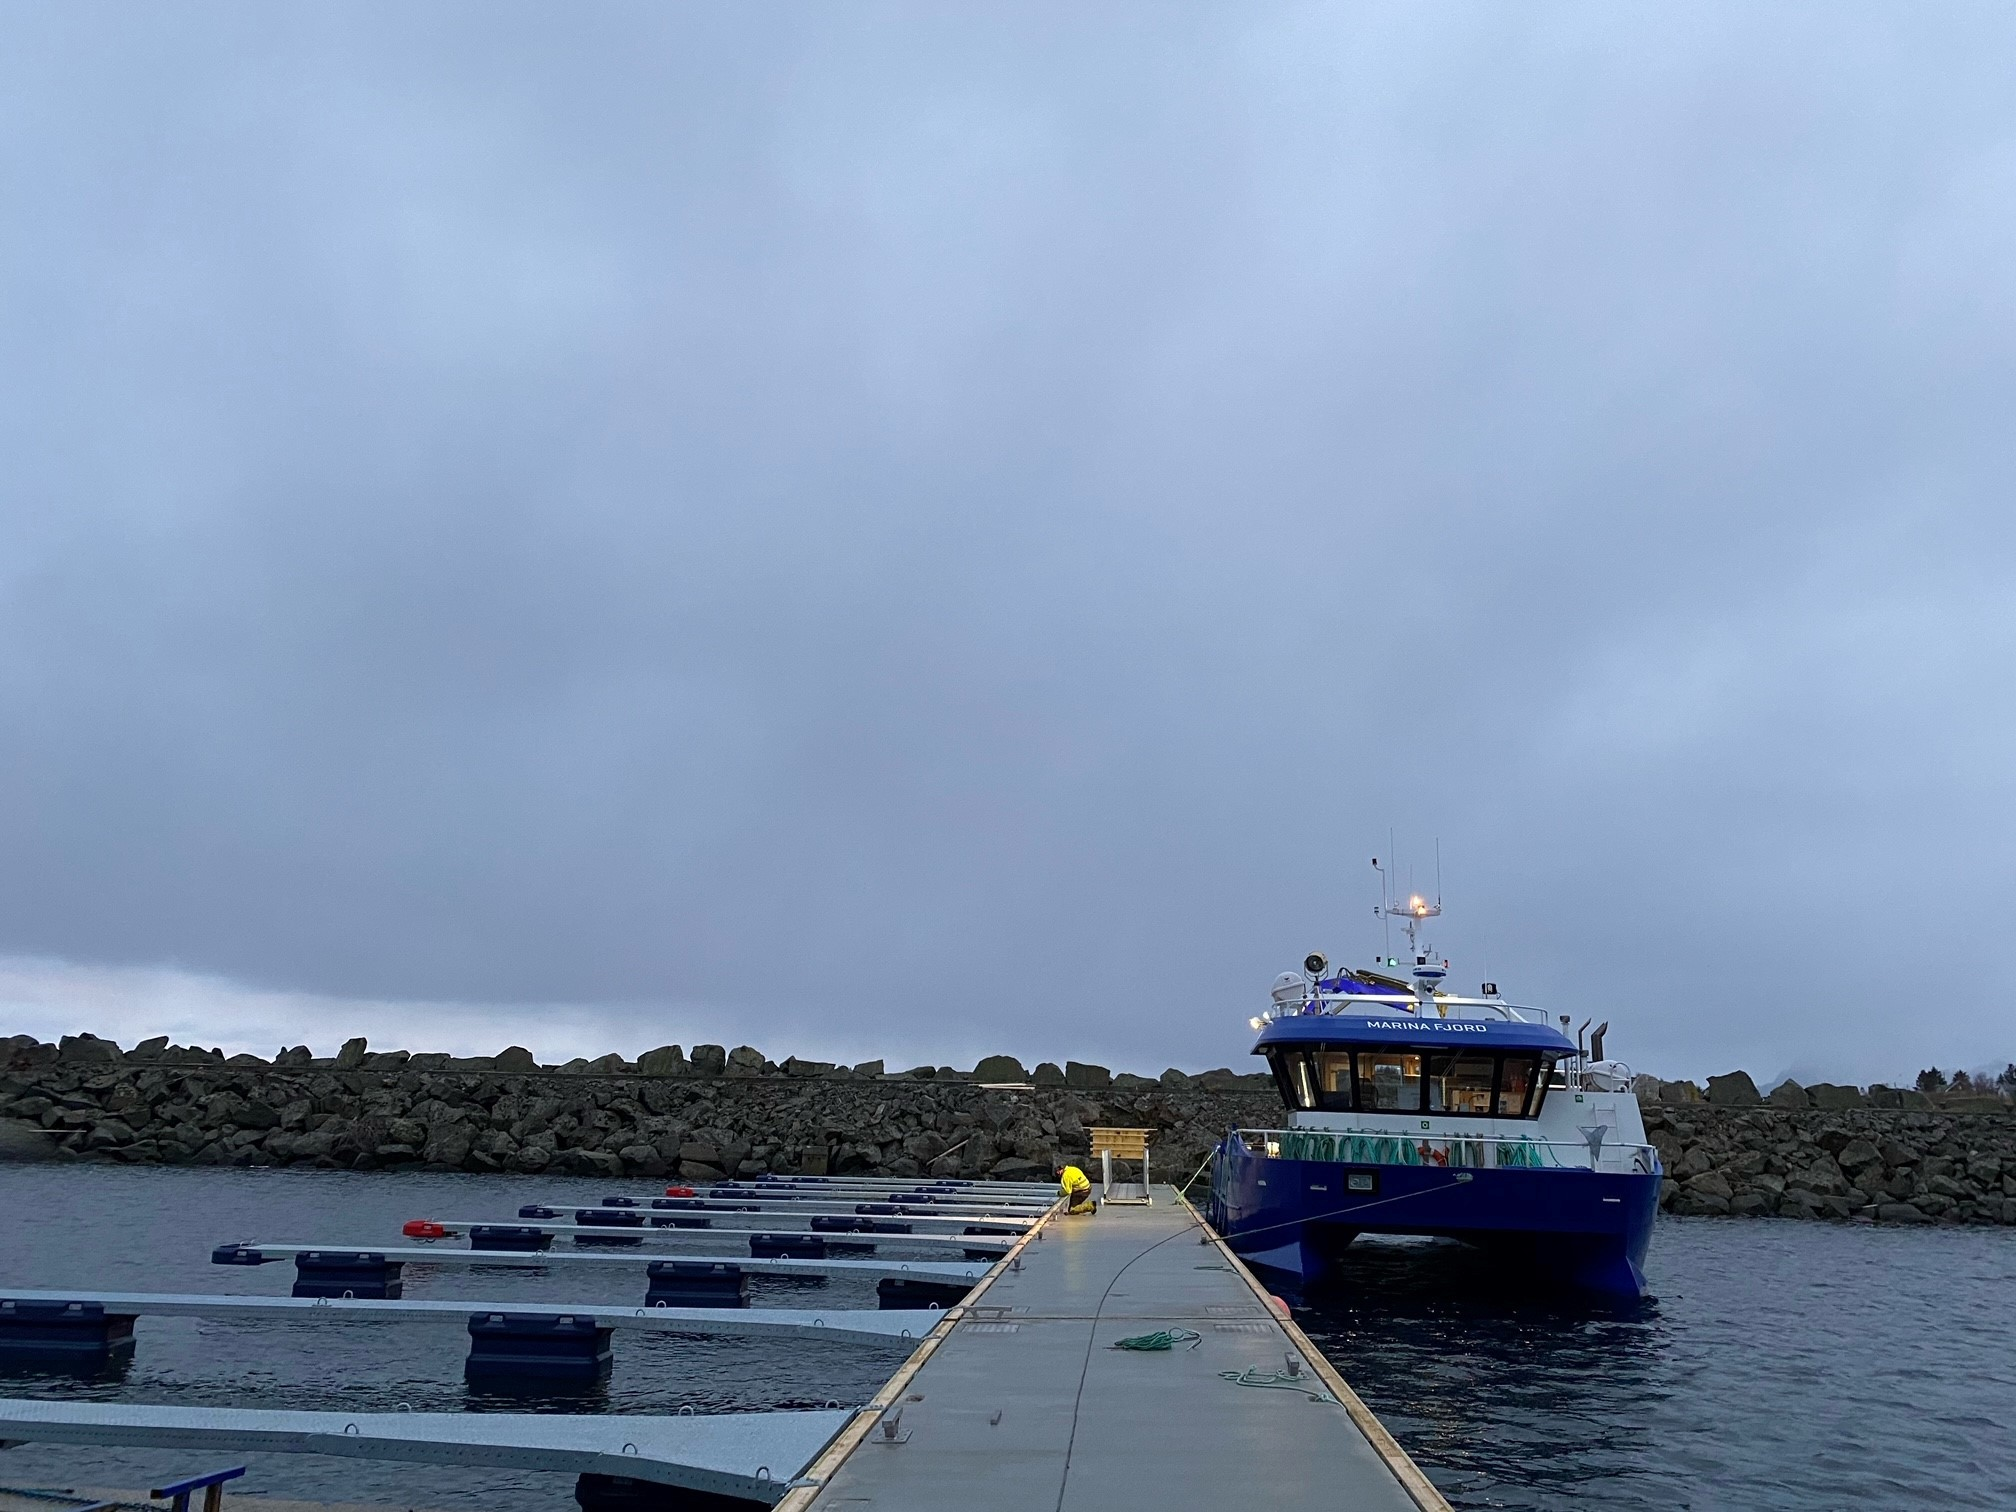 https://marinasolutions.no/uploads/Moskenesvågen-Fiskebåtlag_betongbrygger-og-utriggere-9.jpg